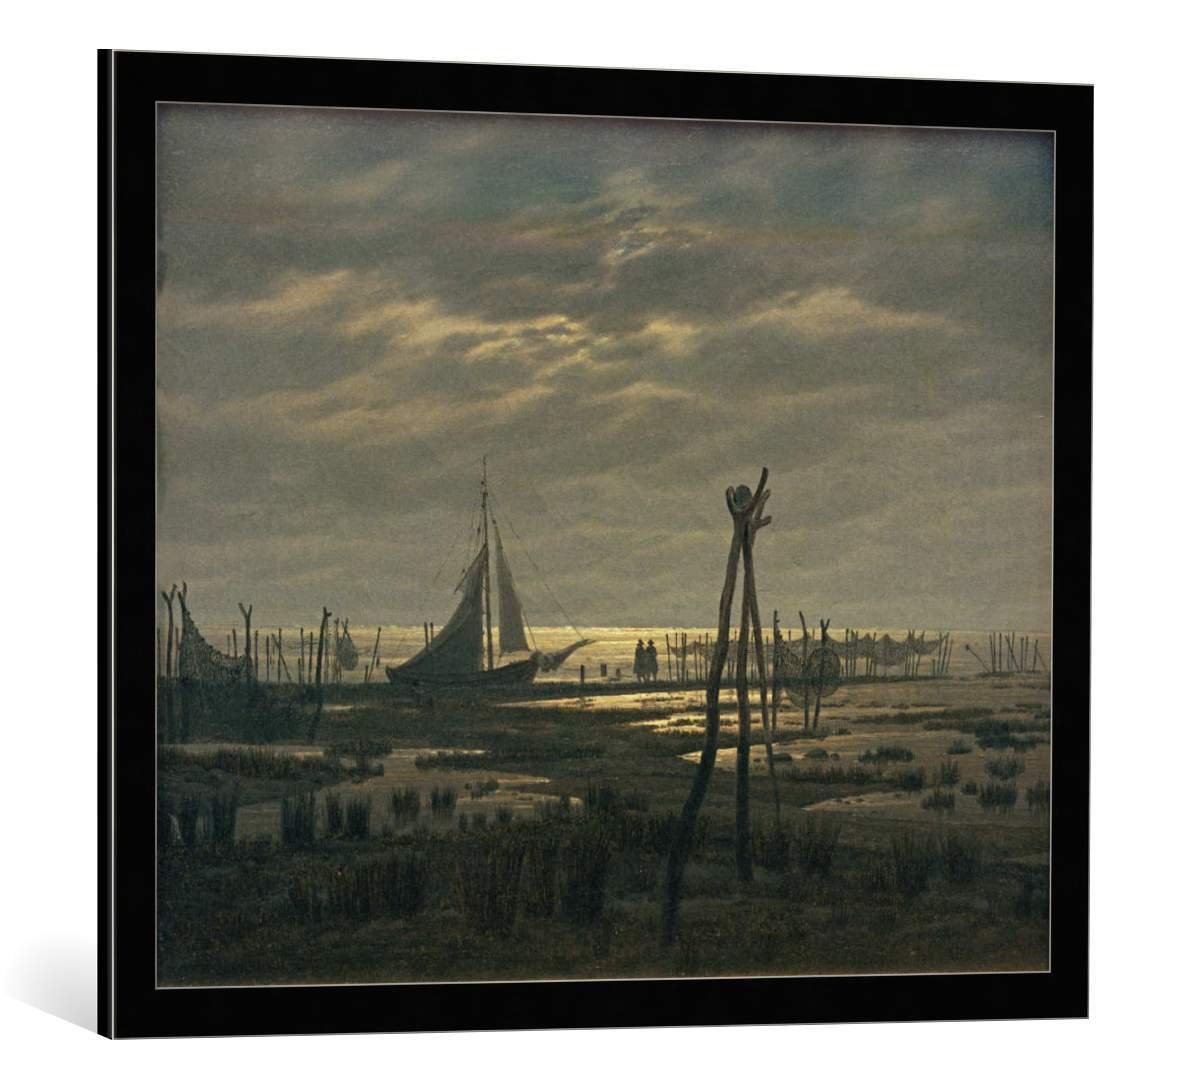 Kunstdruck/Poster: Caspar David Friedrich Sumpfiger Strand ...